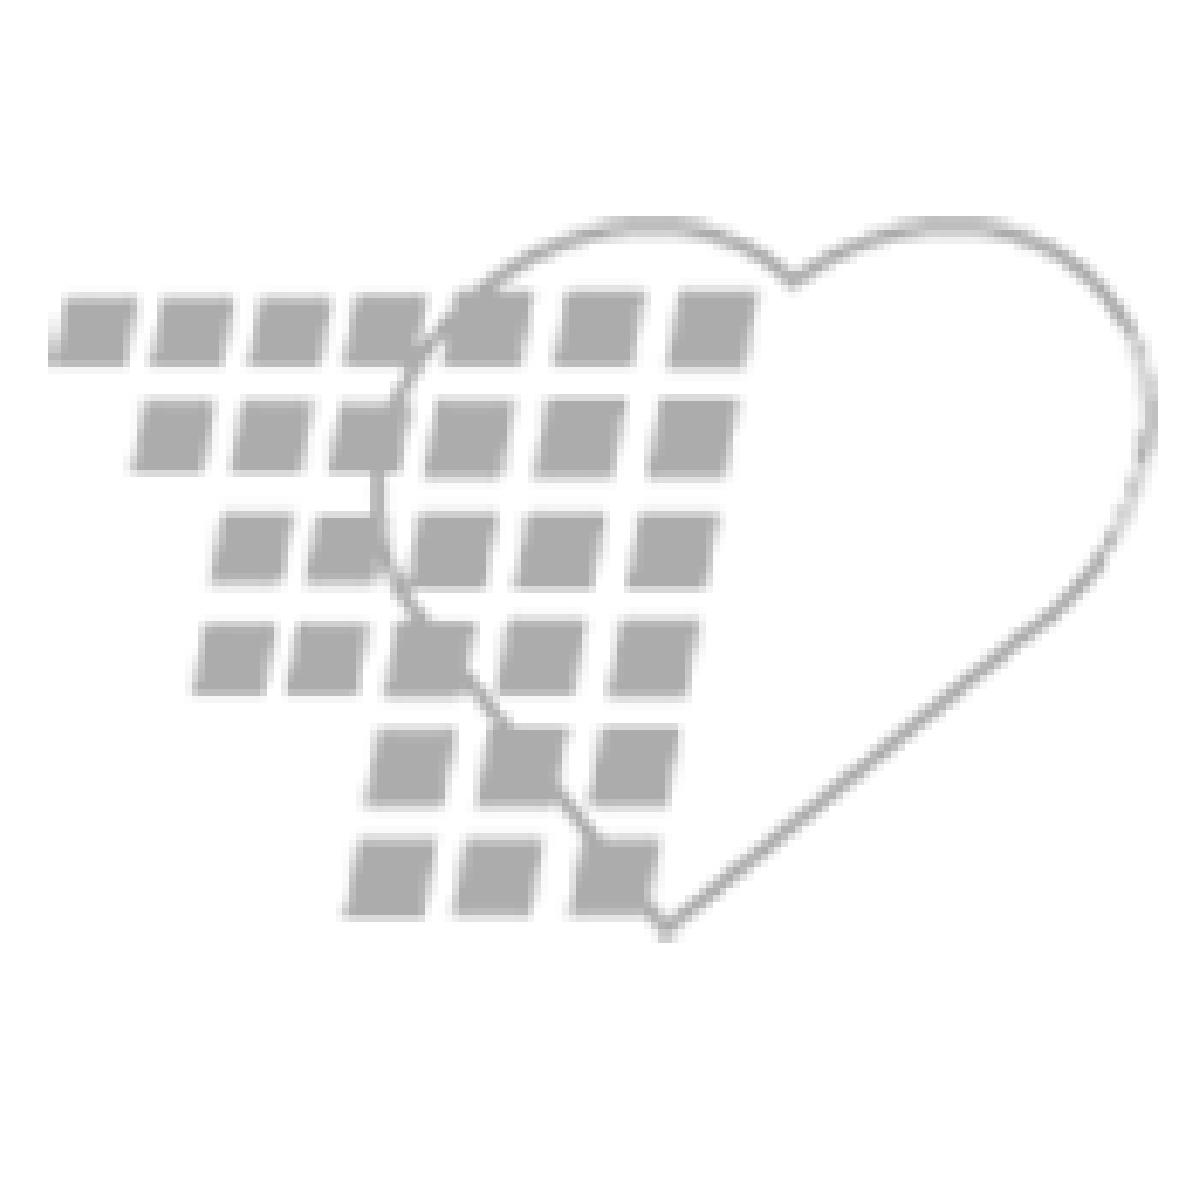 11-81-1108 Nasco Life/form® Intraosseous Infusion Simulator